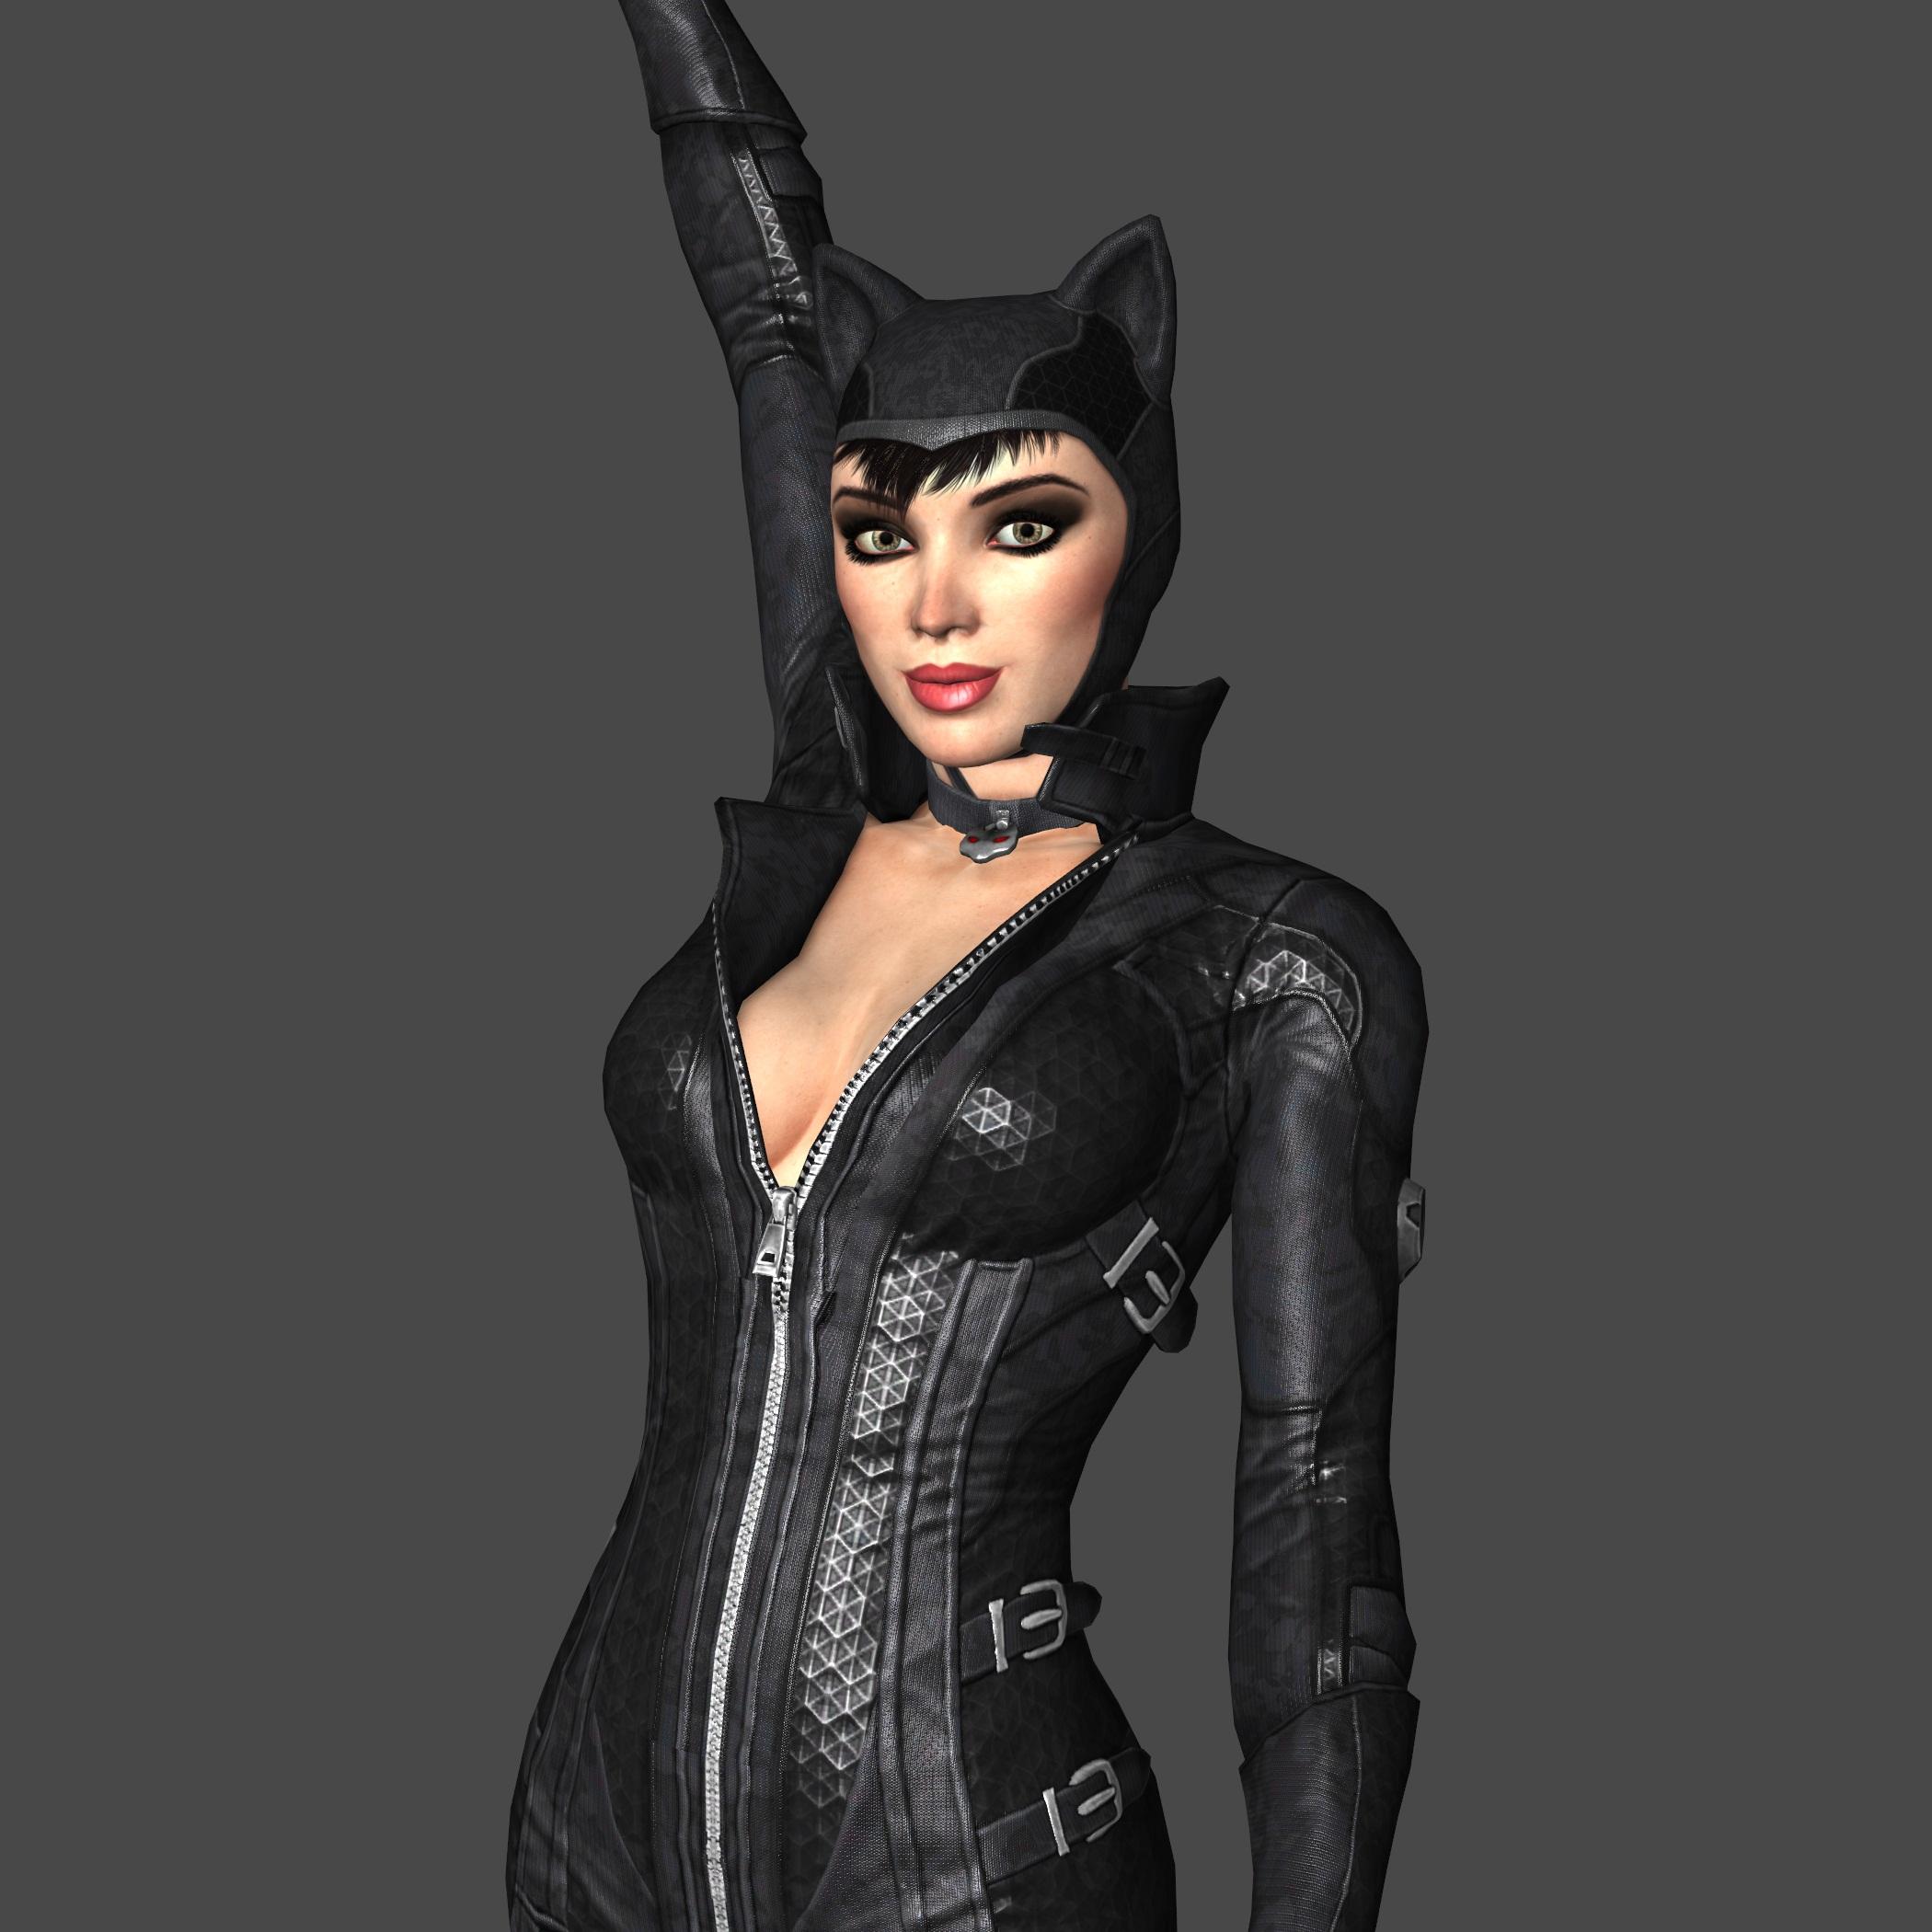 Catwoman from Batman Arkham City 01 by Subzero91 on DeviantArt